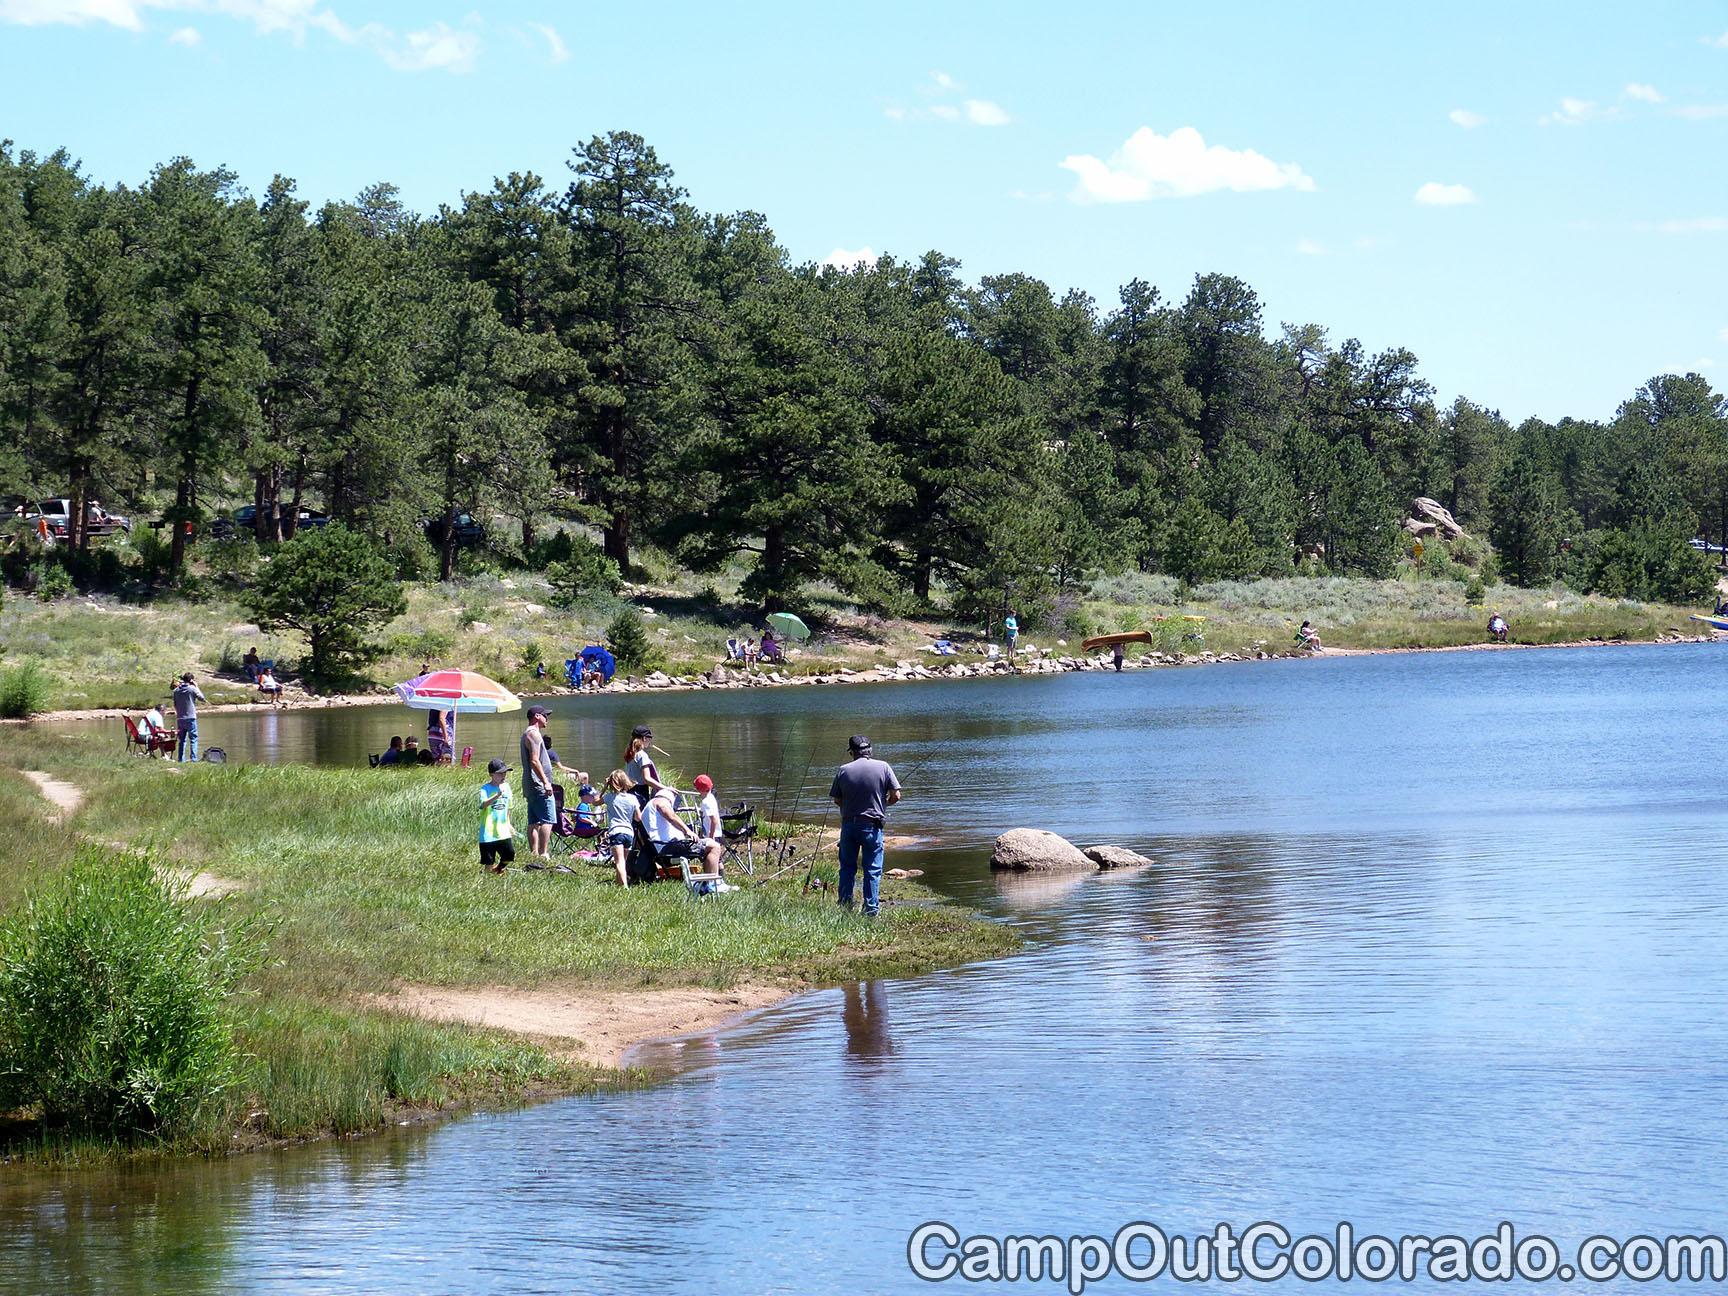 Campoutcolorado-dowdy-lake-campground-day-fishing